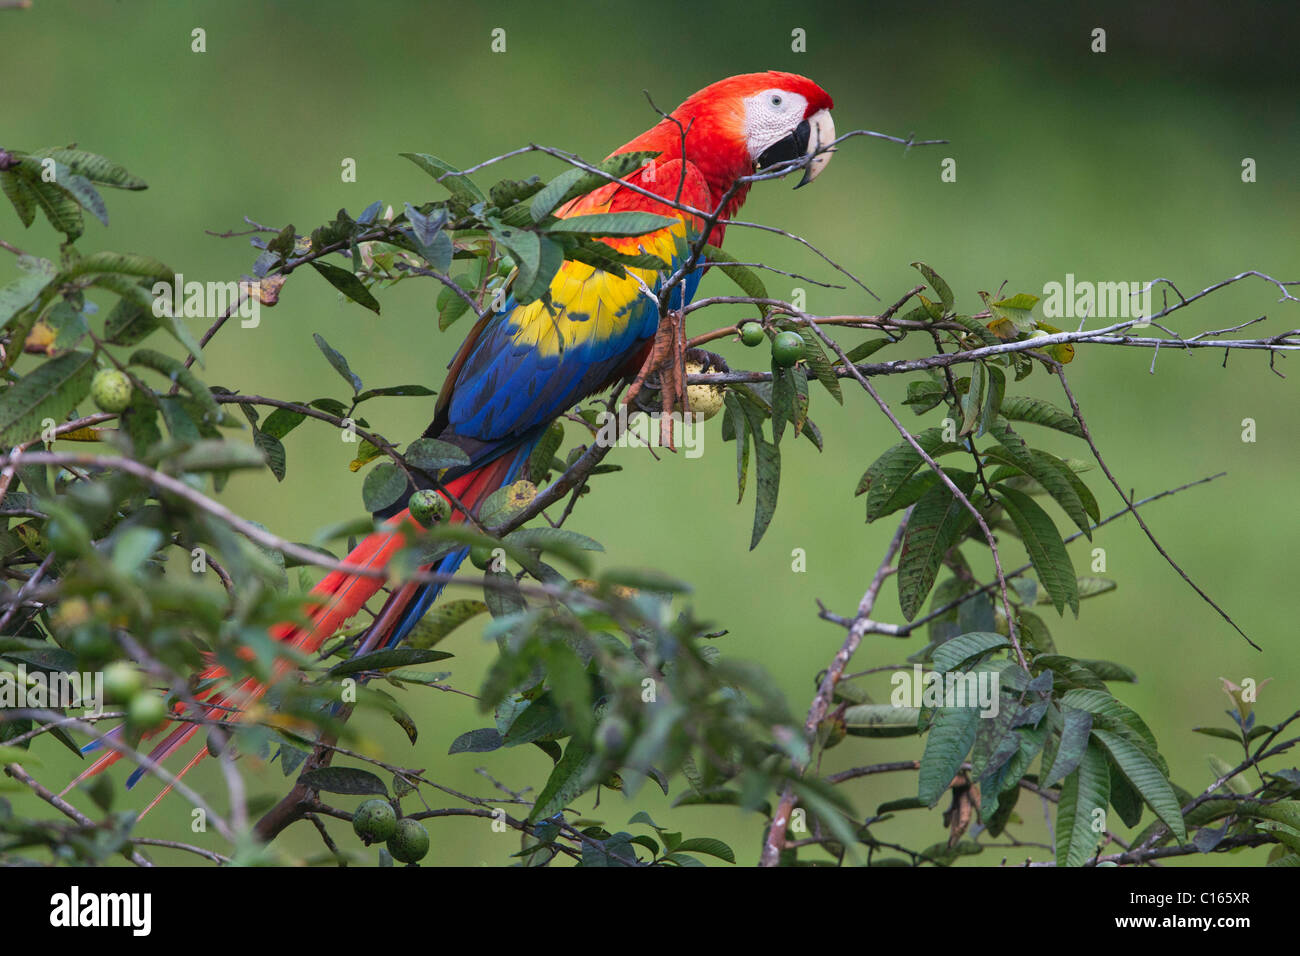 Scarlet Macaw (Ara macao) feeding on a branch, Costa Rica, Osa Peninsula. - Stock Image